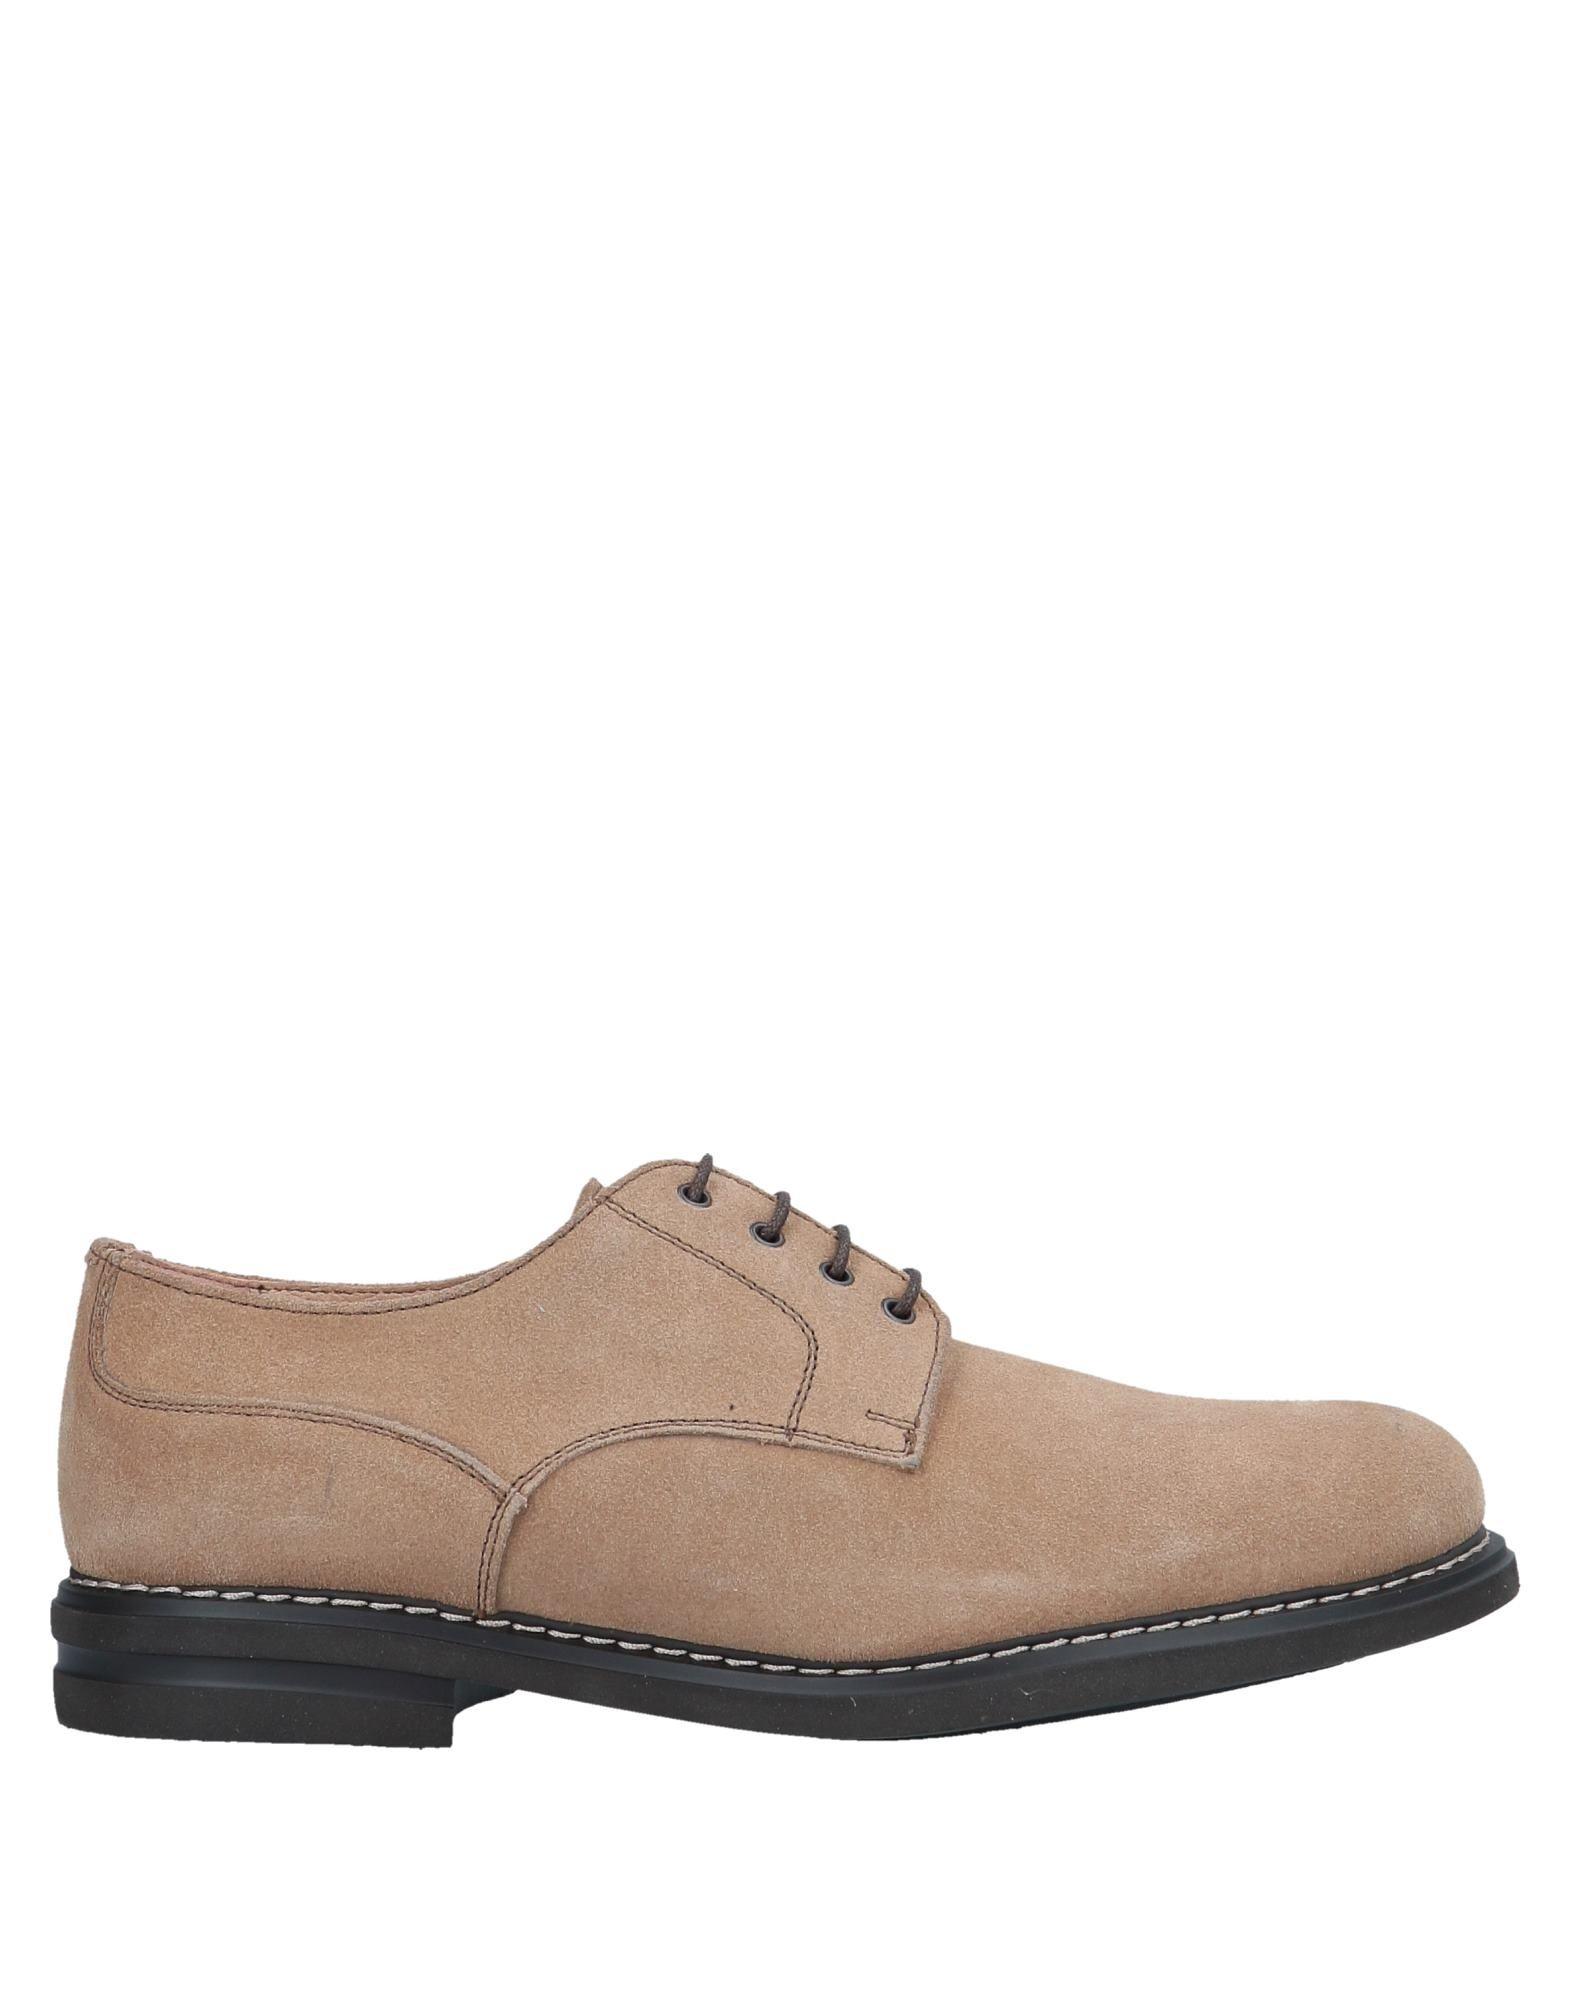 BALDININI Обувь на шнурках мокасины baldinini baldinini ba097awzyg29